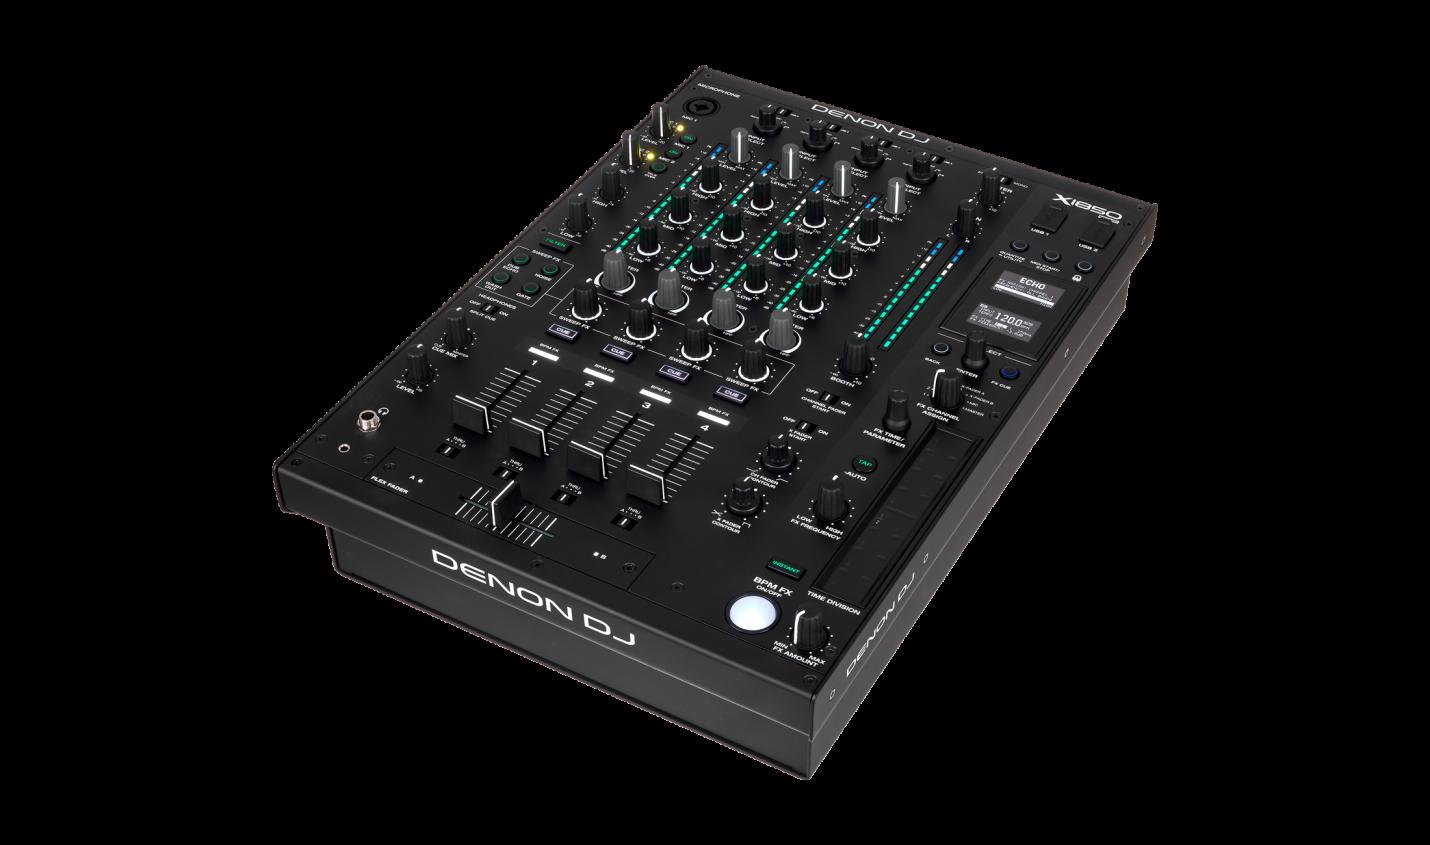 Test: Denon DJ X1850 Prime / Vierkanal-Mixer für DJs